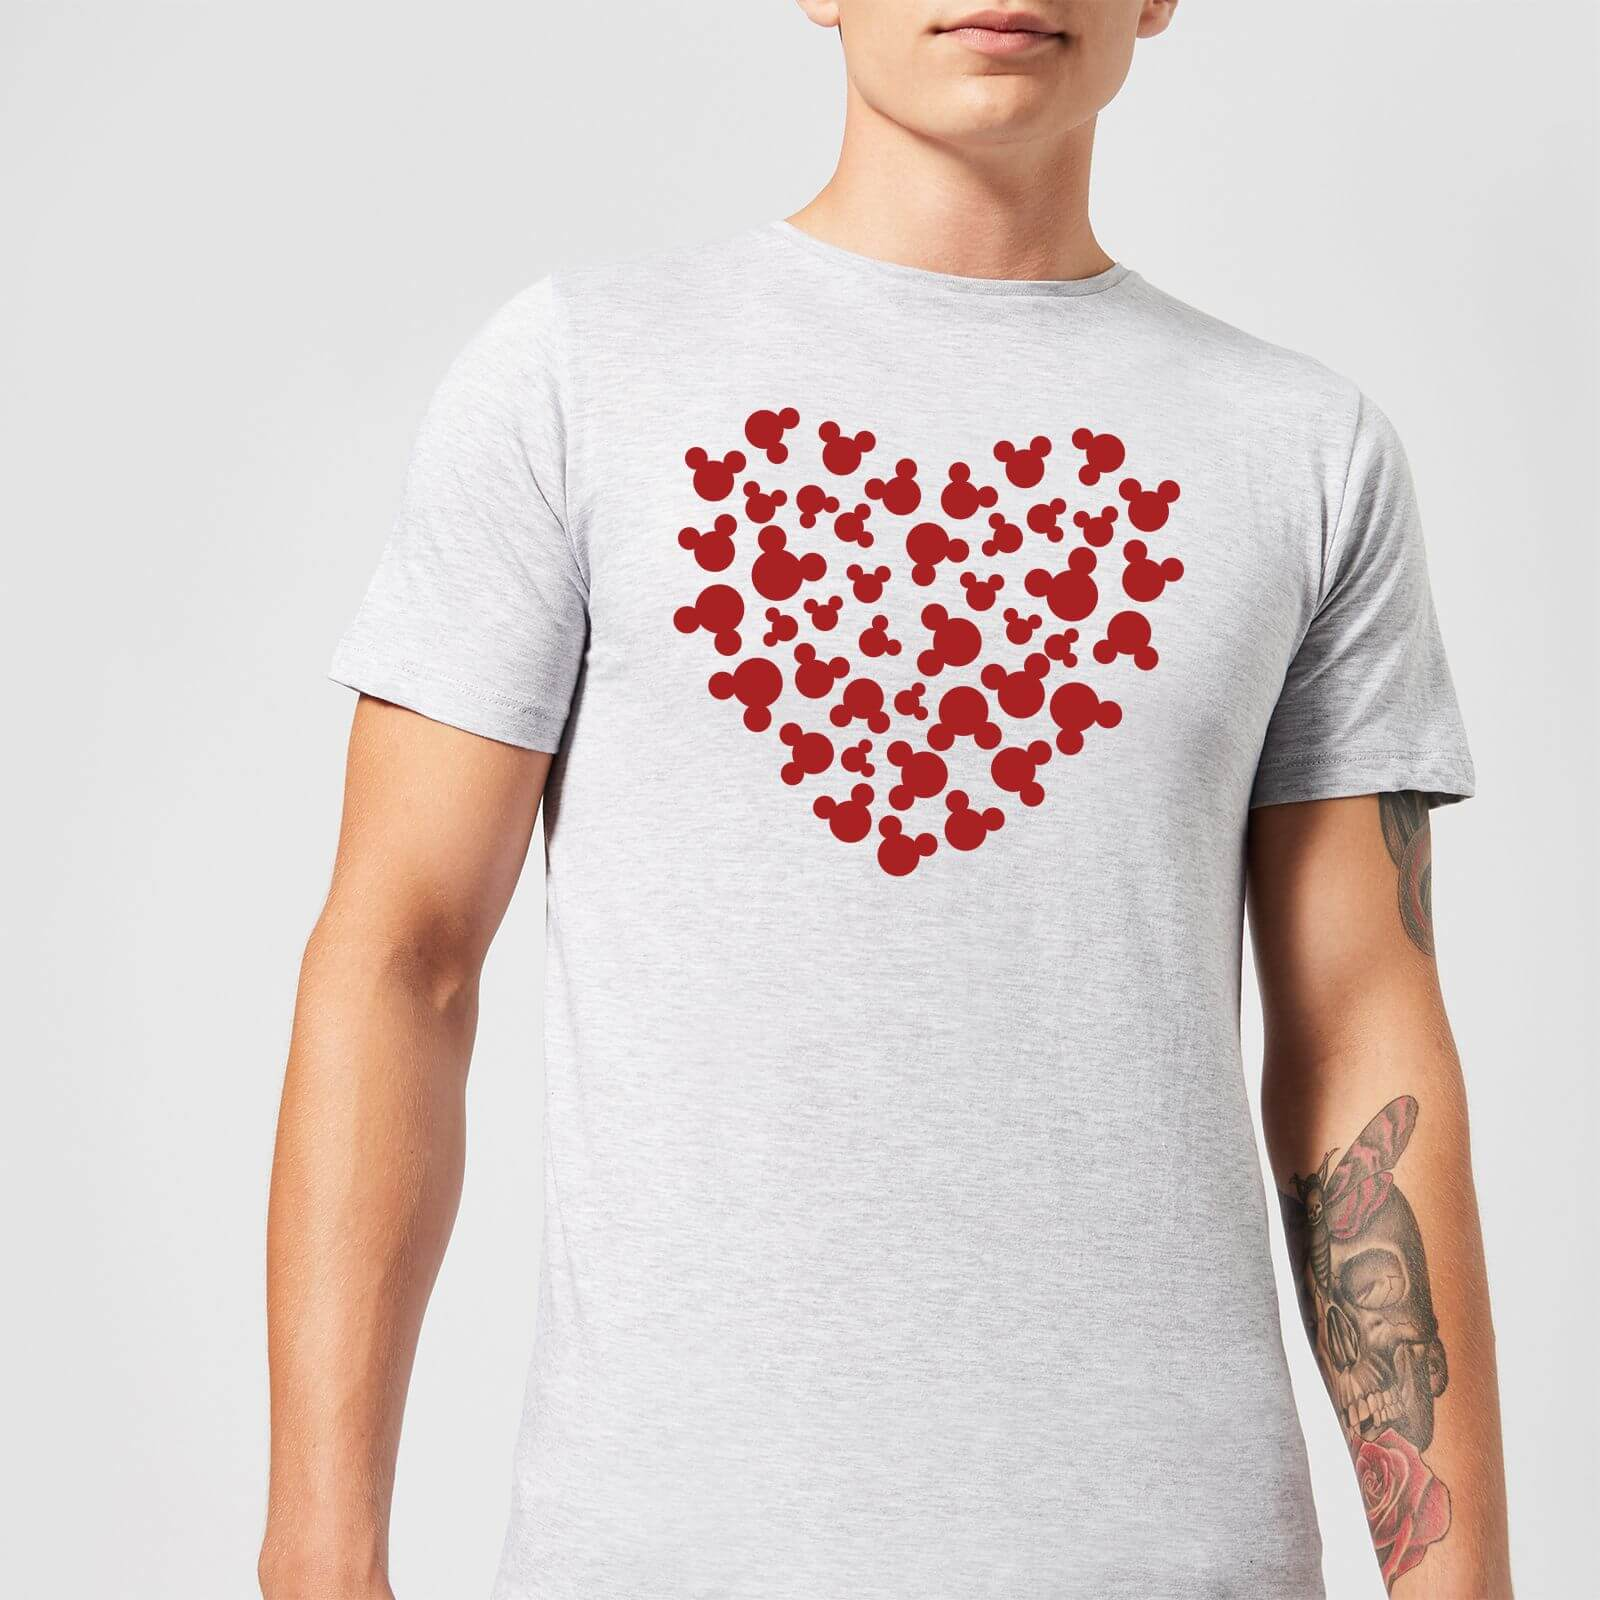 Disney Disney Mickey Mouse Heart Silhouette T-Shirt - Grey - 5XL - Grey